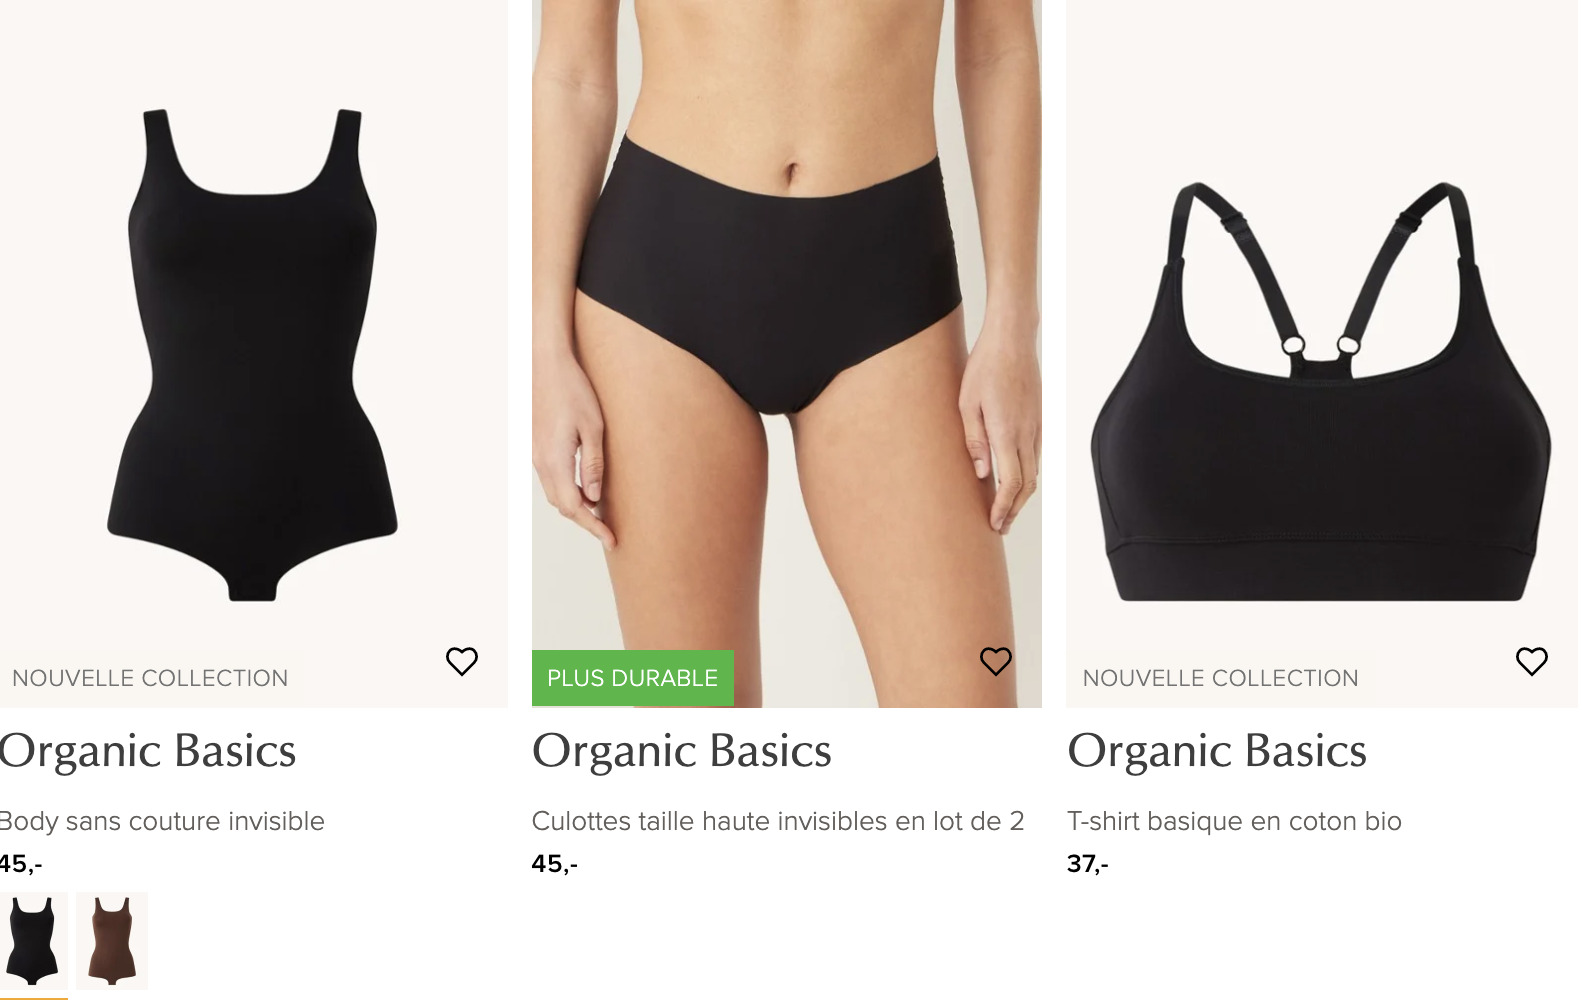 organics basics essentiels